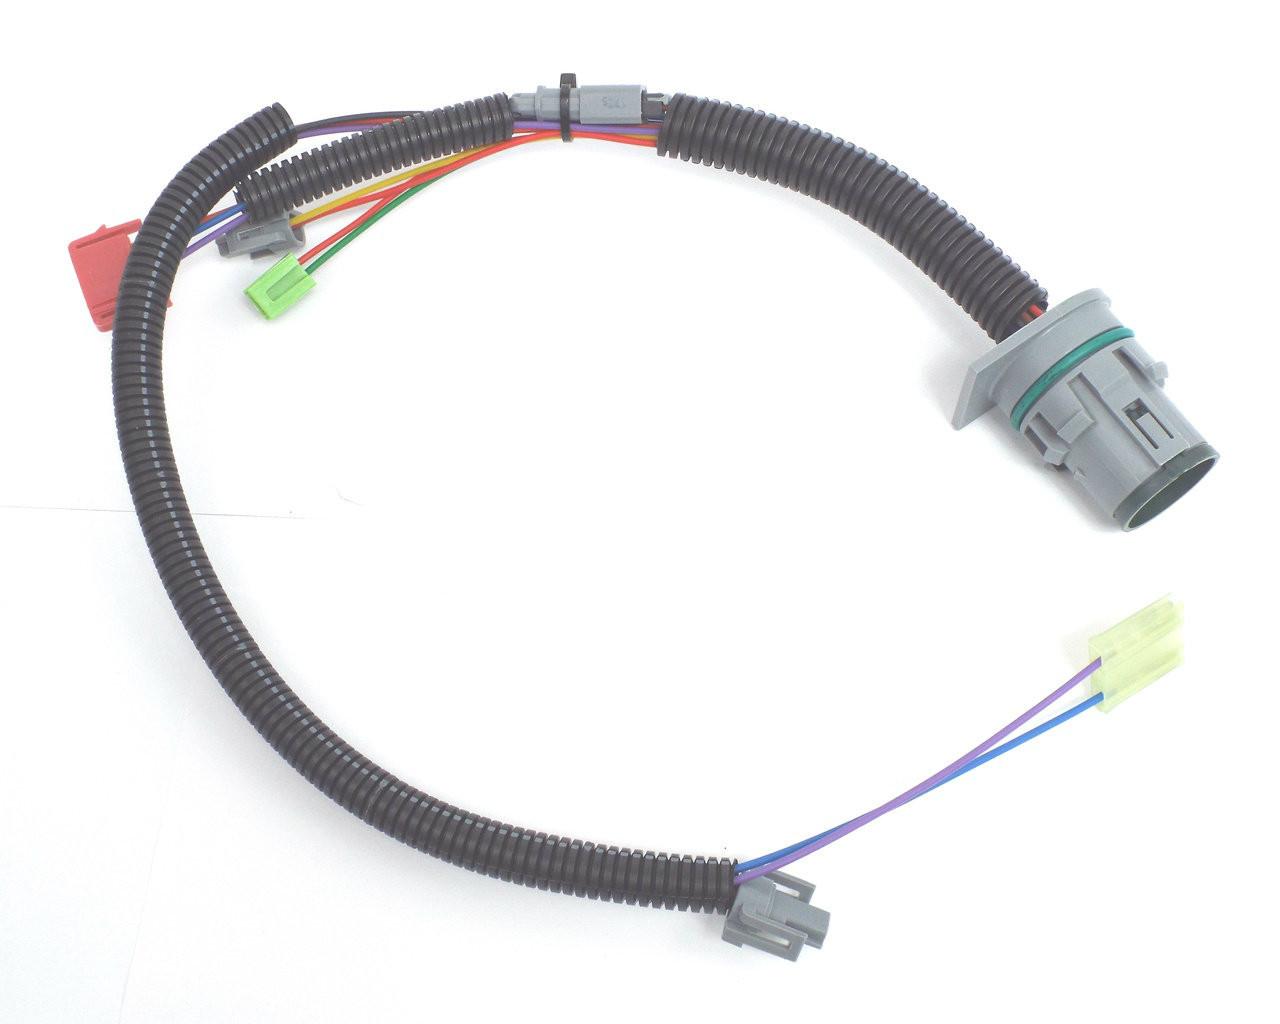 4l80e wiring harness new 4l80e transmission hd internal valve body wiring harness  1991 4l80e wiring harness failure internal valve body wiring harness